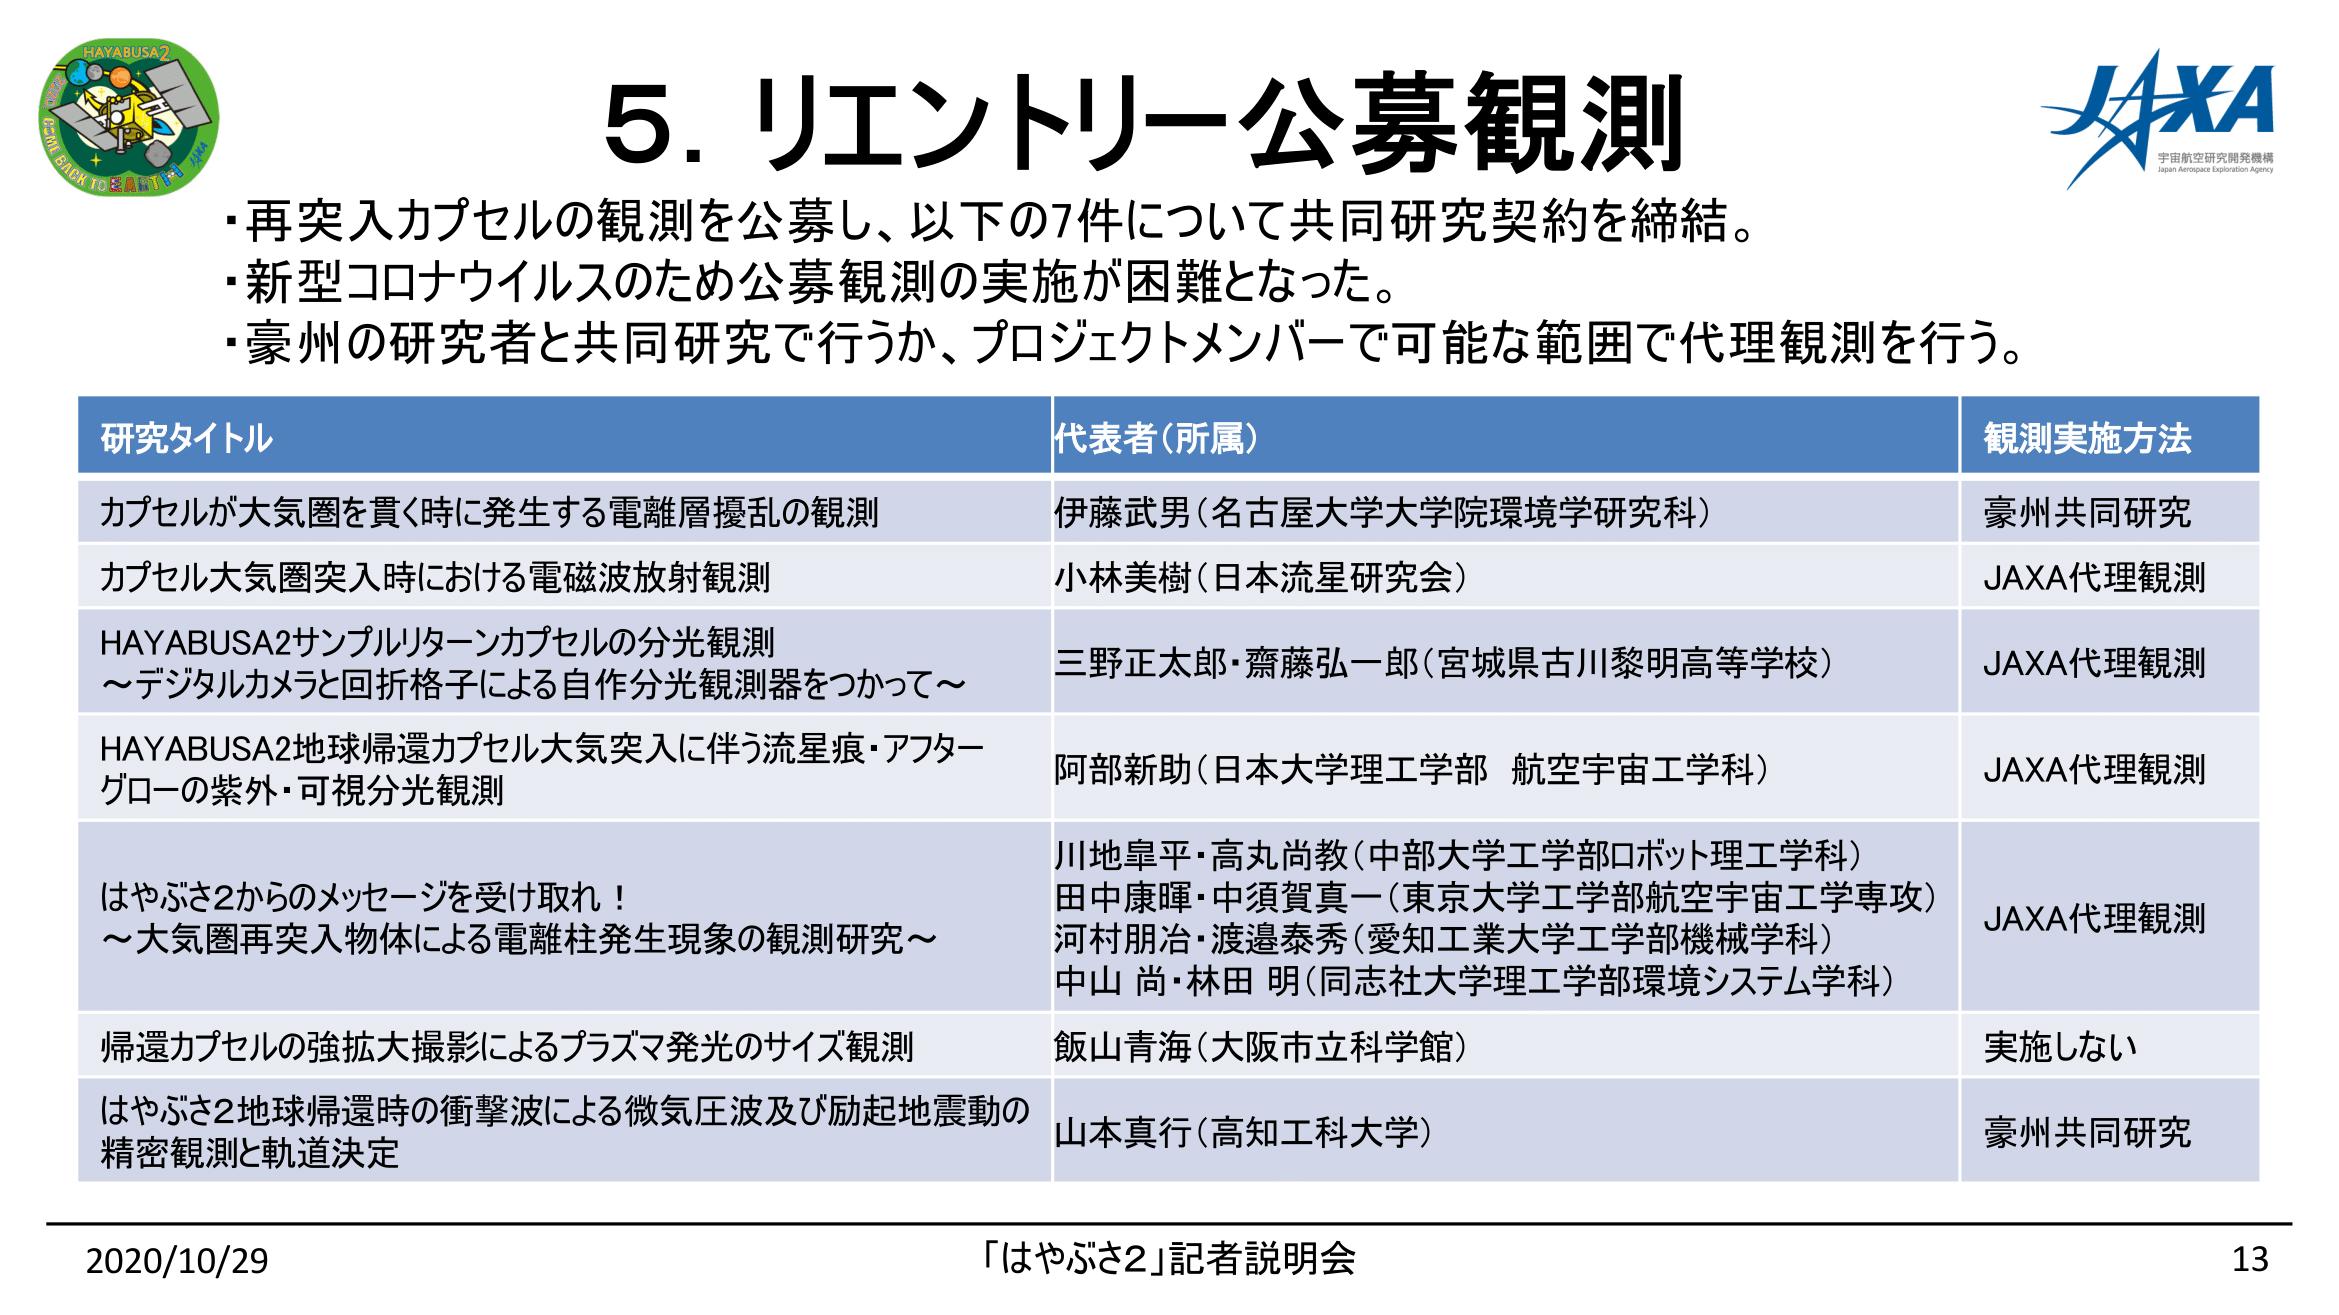 f:id:Imamura:20201029161352p:plain